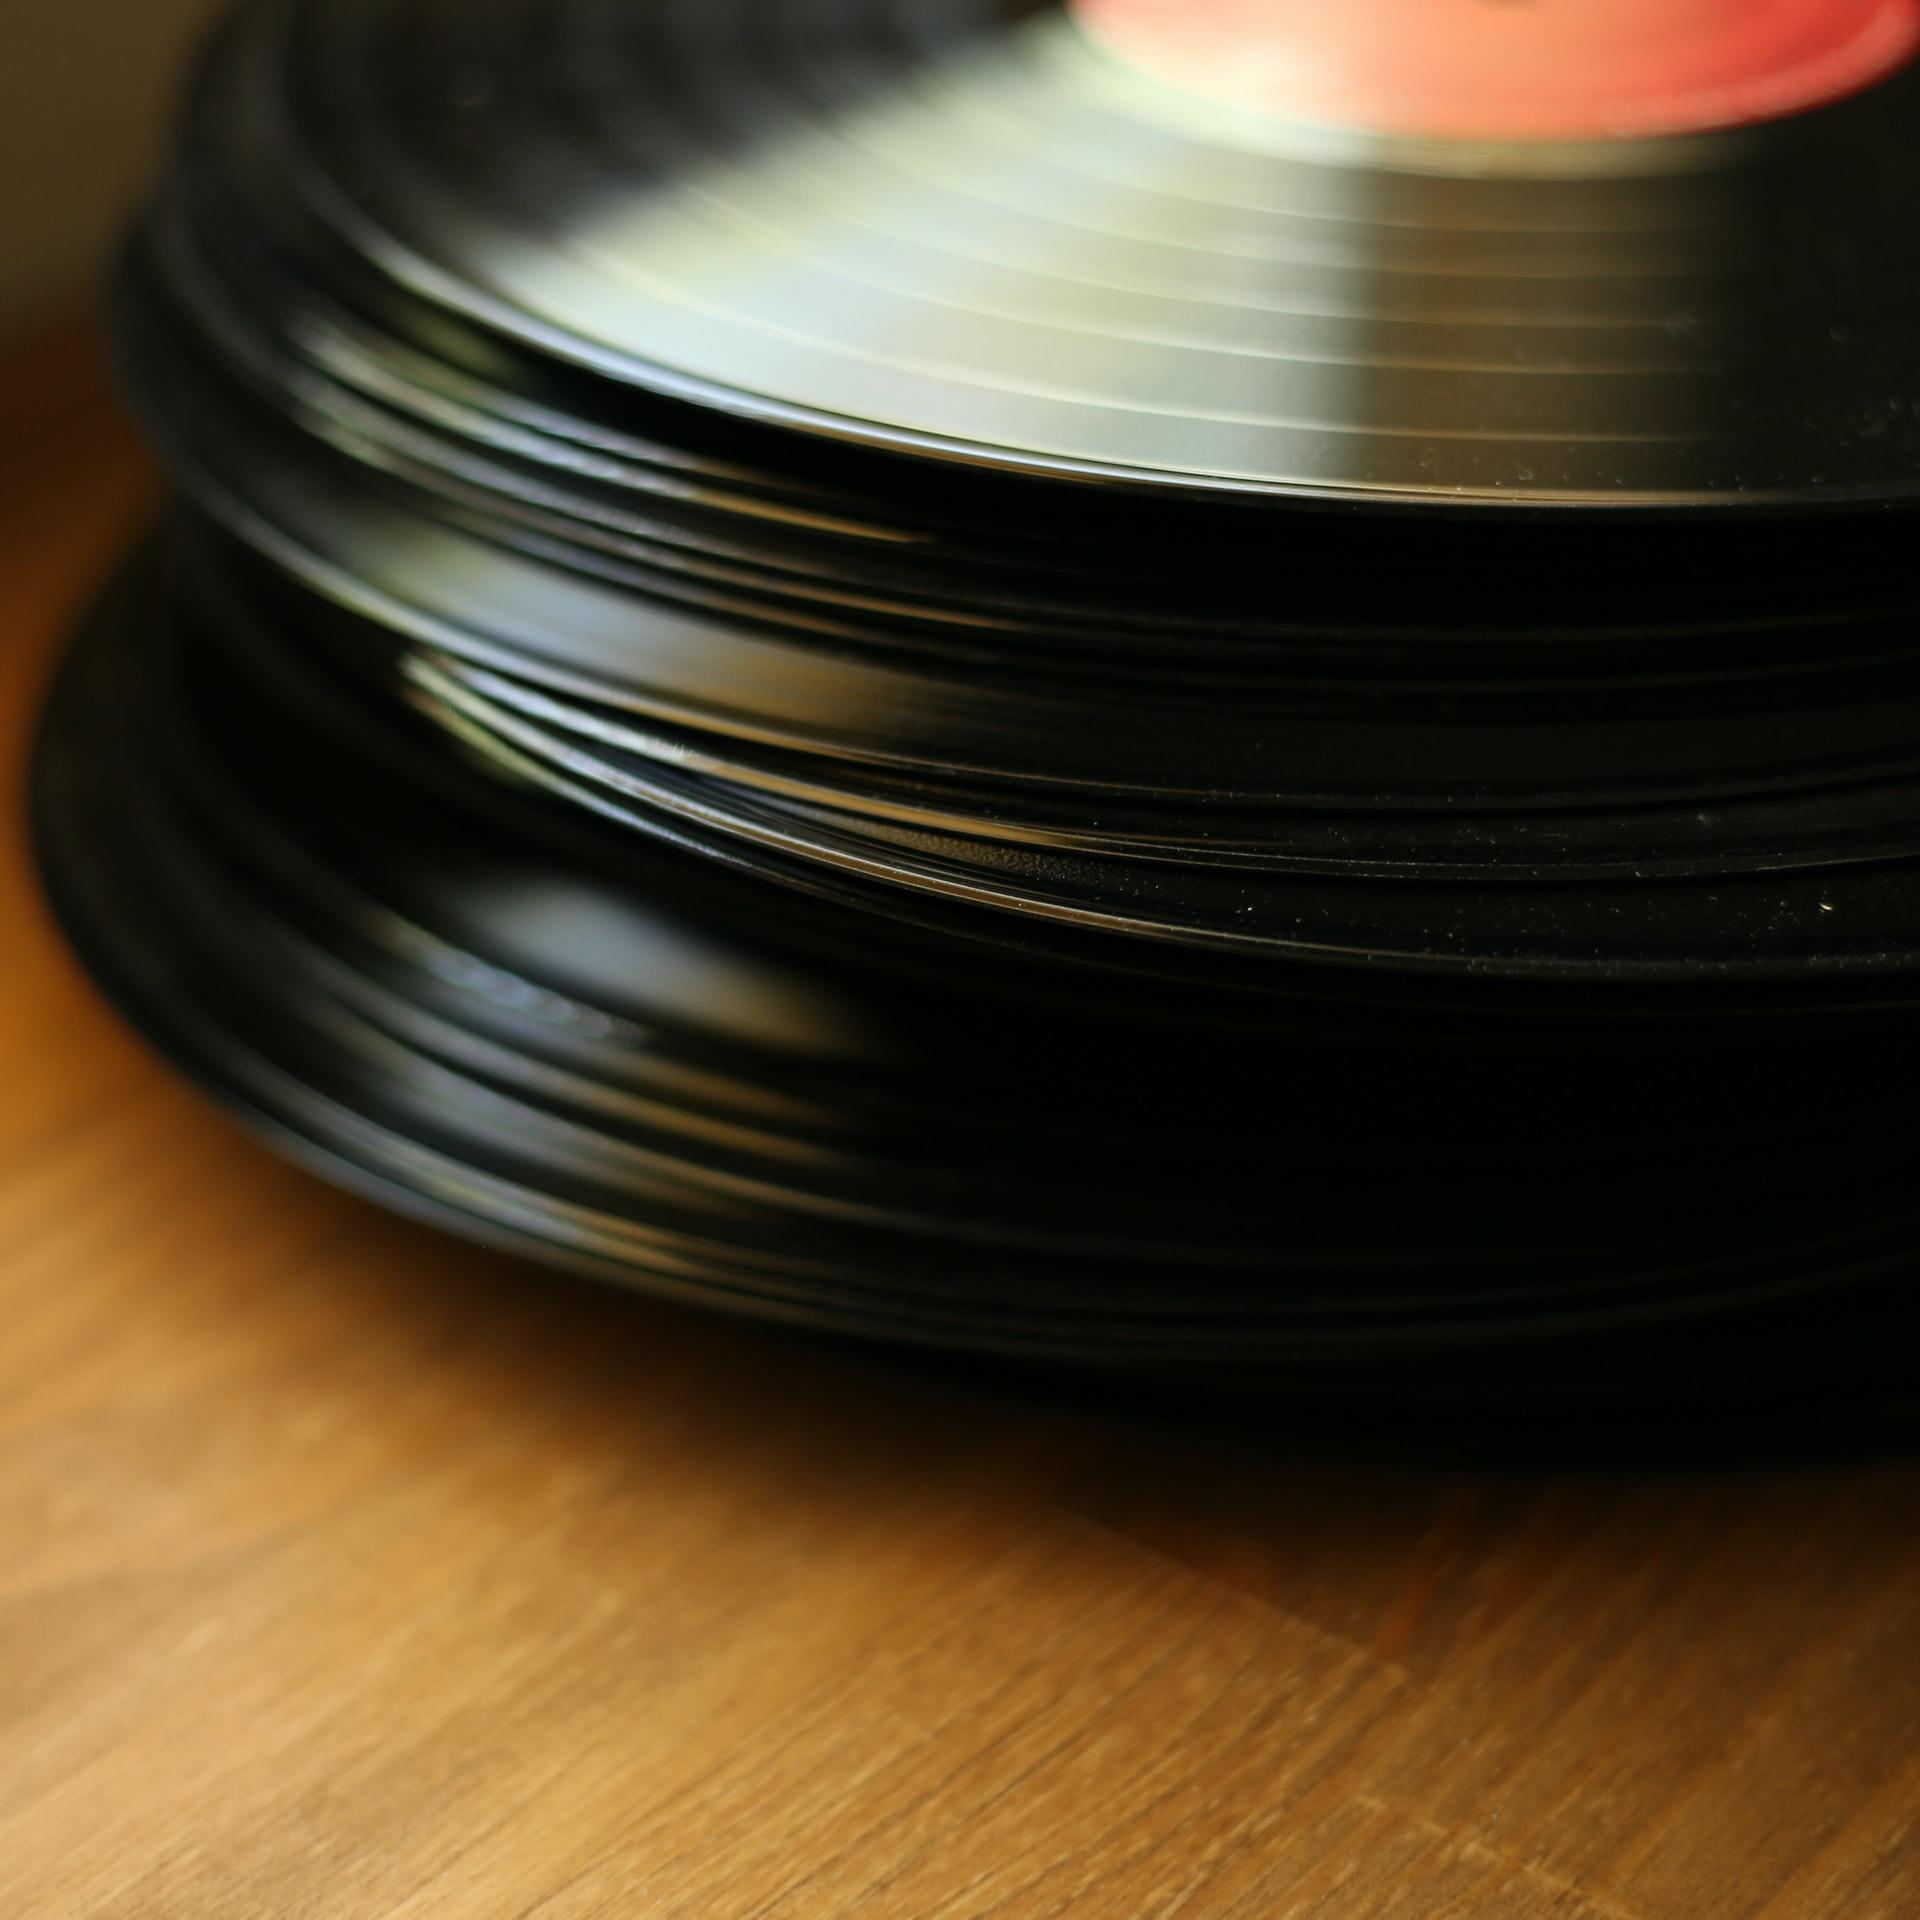 Musica in tavola